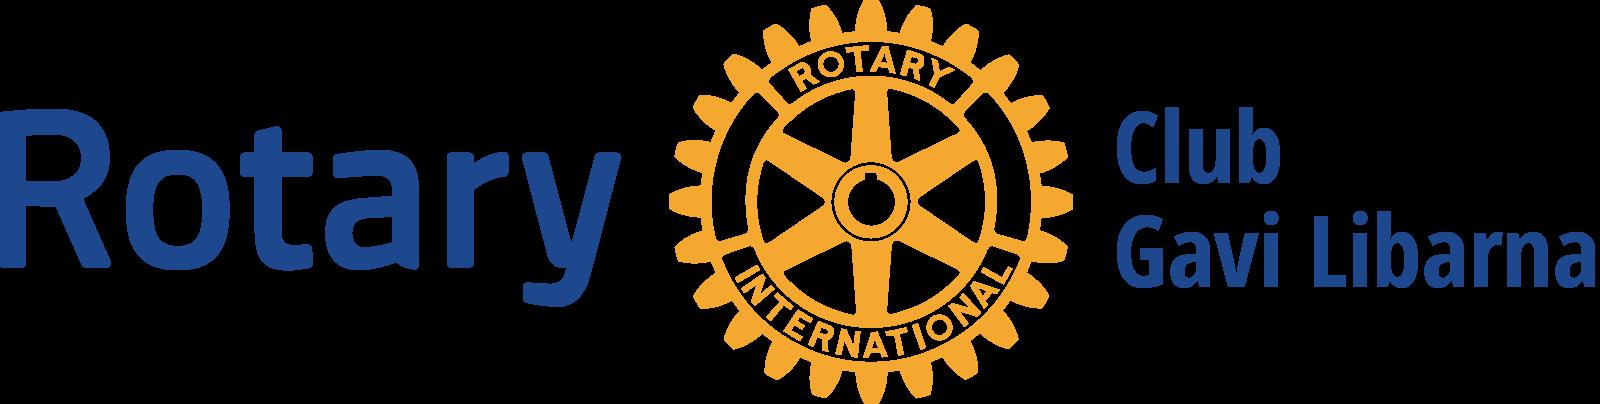 Rotary Club Gavi Libarna